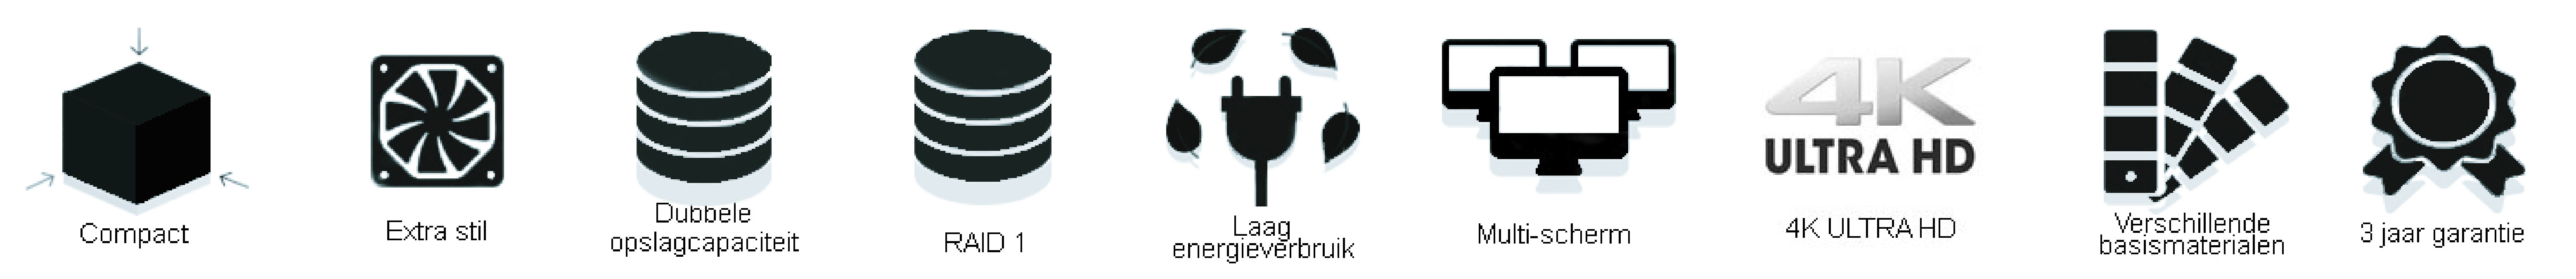 https://www.bleujour.com/wp-content/uploads/2020/06/200608_bandeau_picto_move_nl.jpg